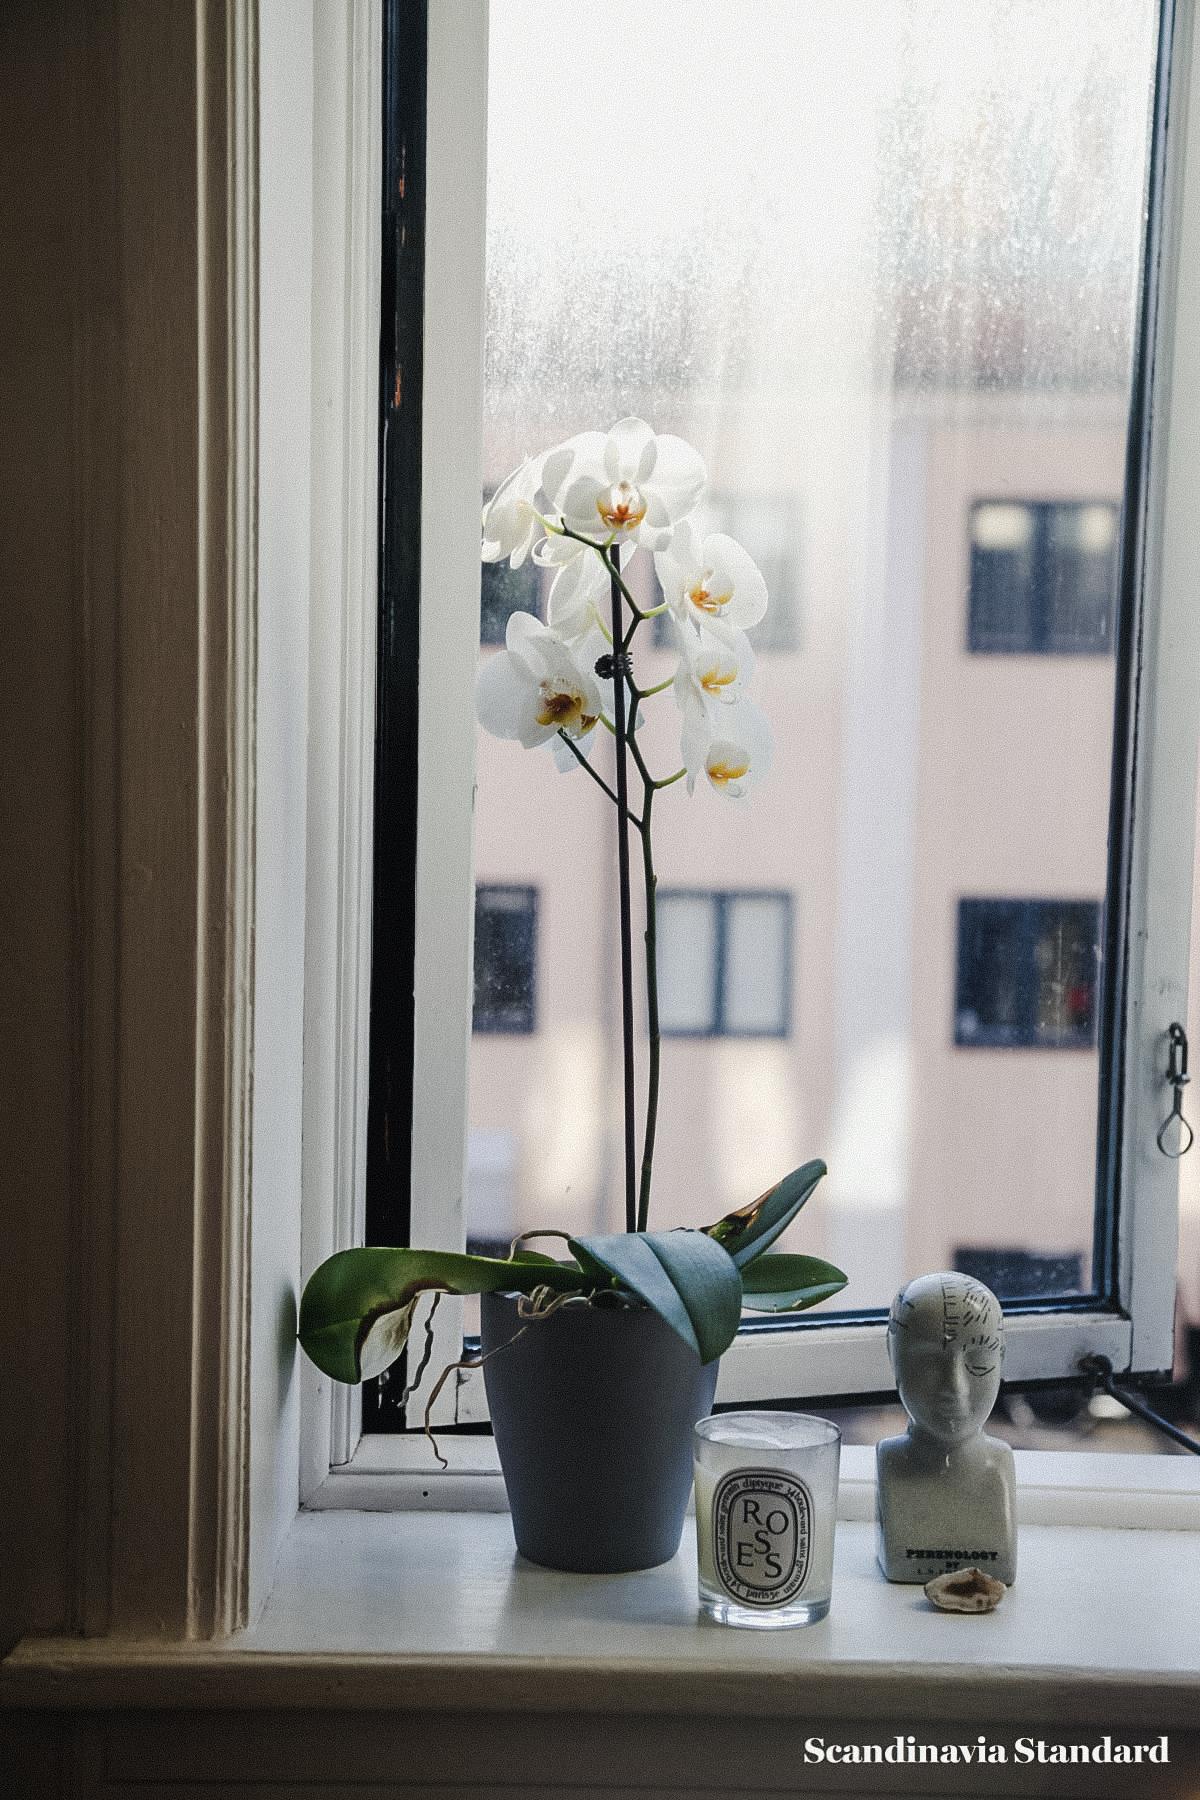 the-white-room-rebeccas-nordvest-apartment-copenhagen-interiors-scandianvia-standard-8758